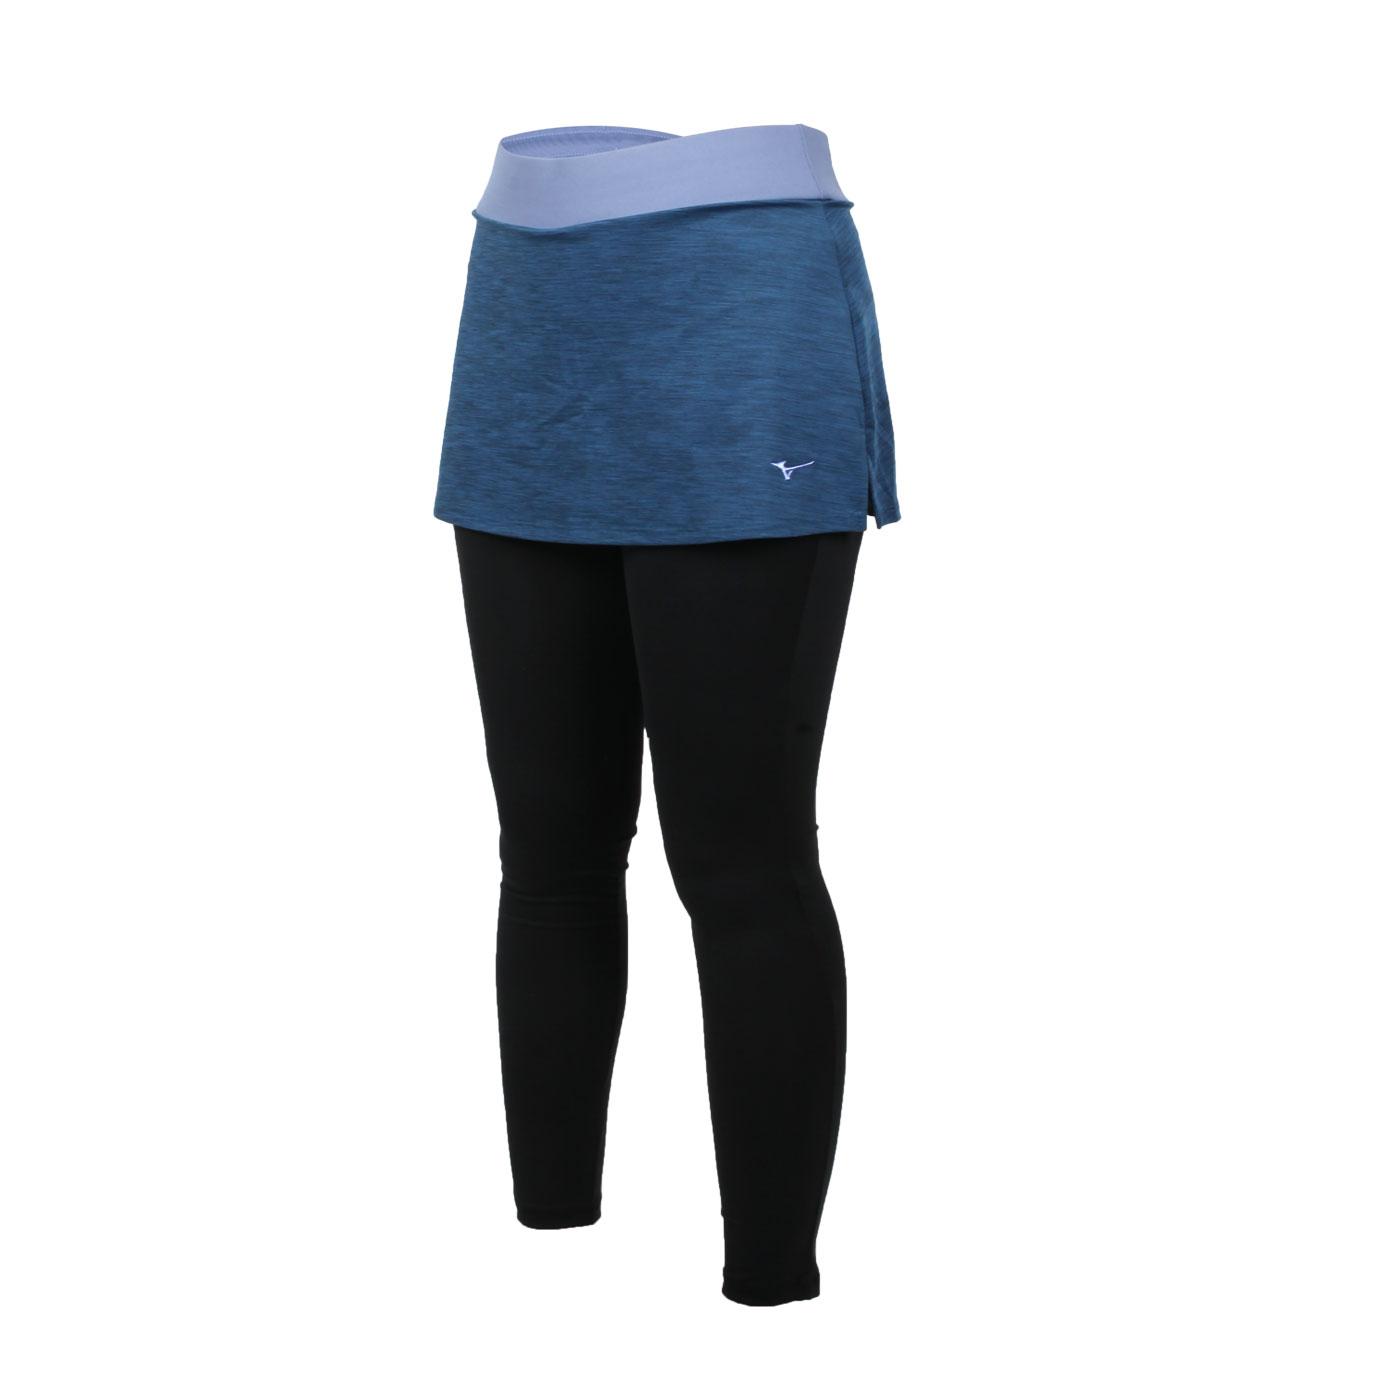 MIZUNO 女款緊身褲裙 K2TB120733 - 深藍粉藍